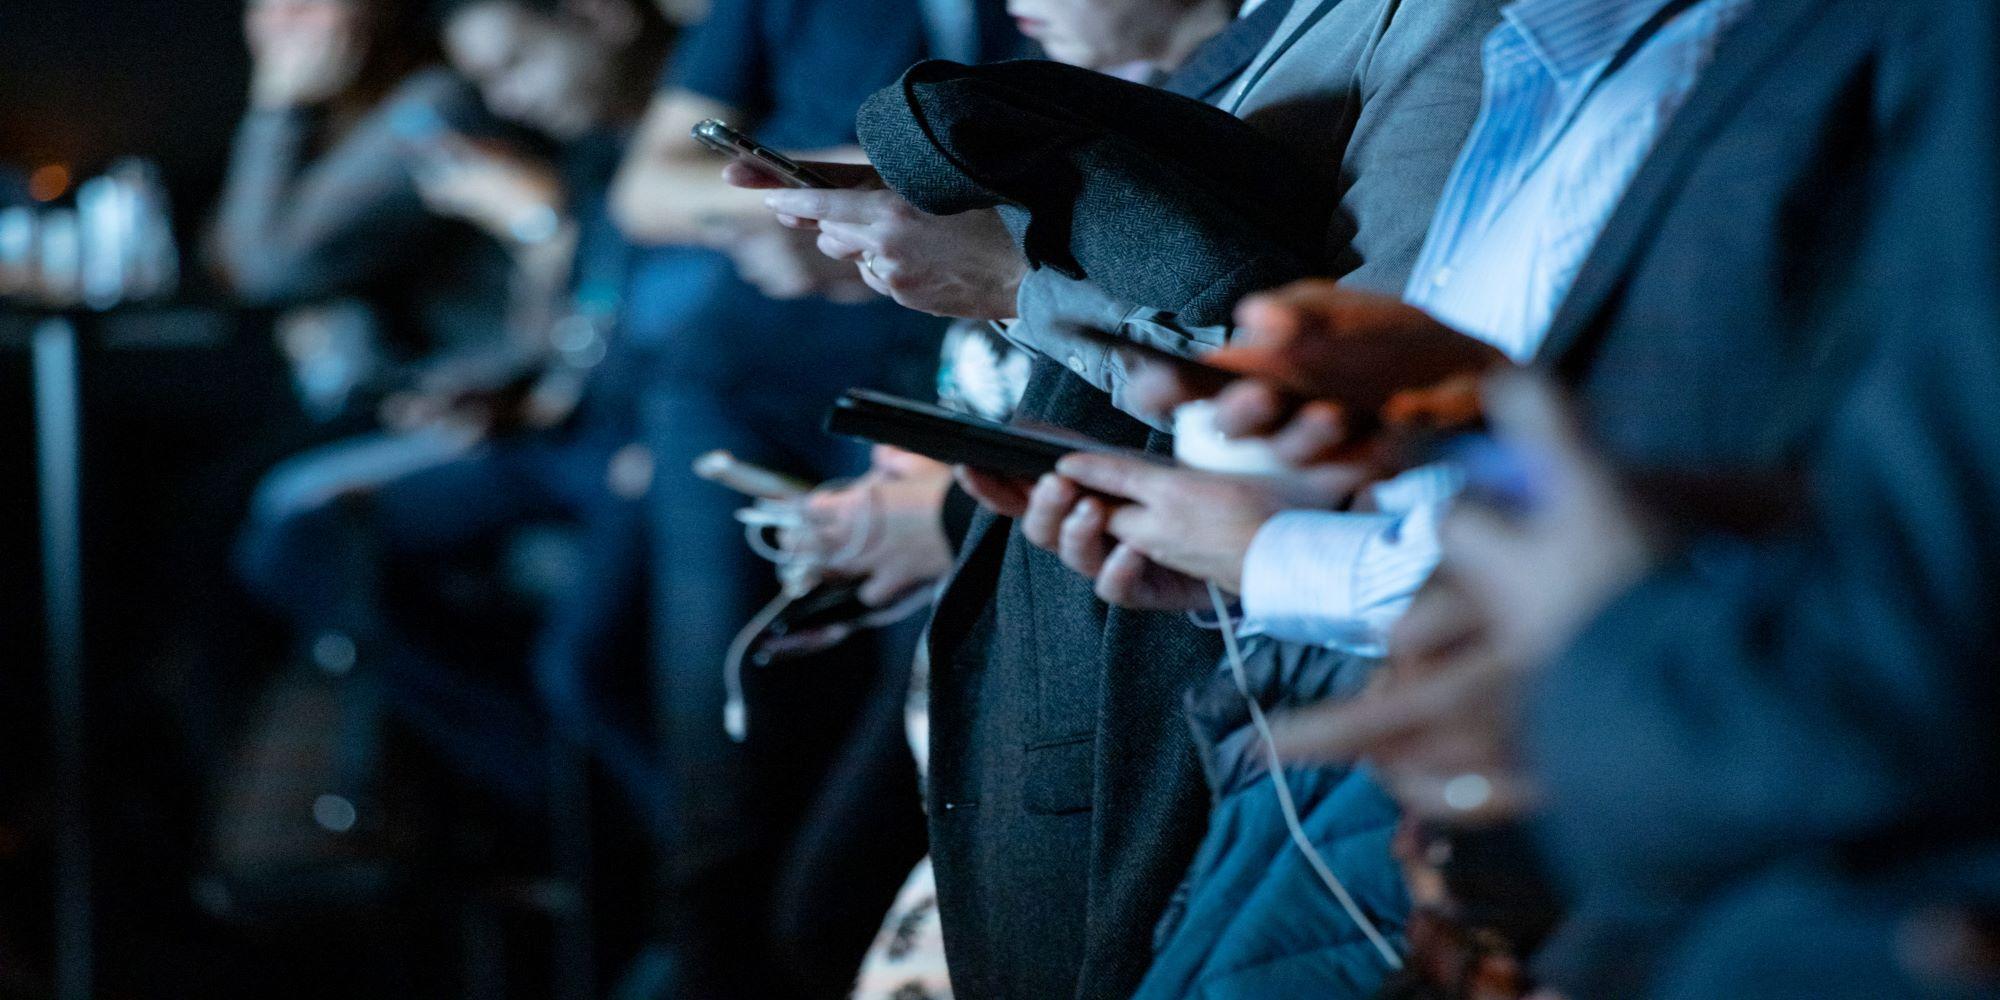 International Marketing News: Global Smartphone Market Shrinks by 6%